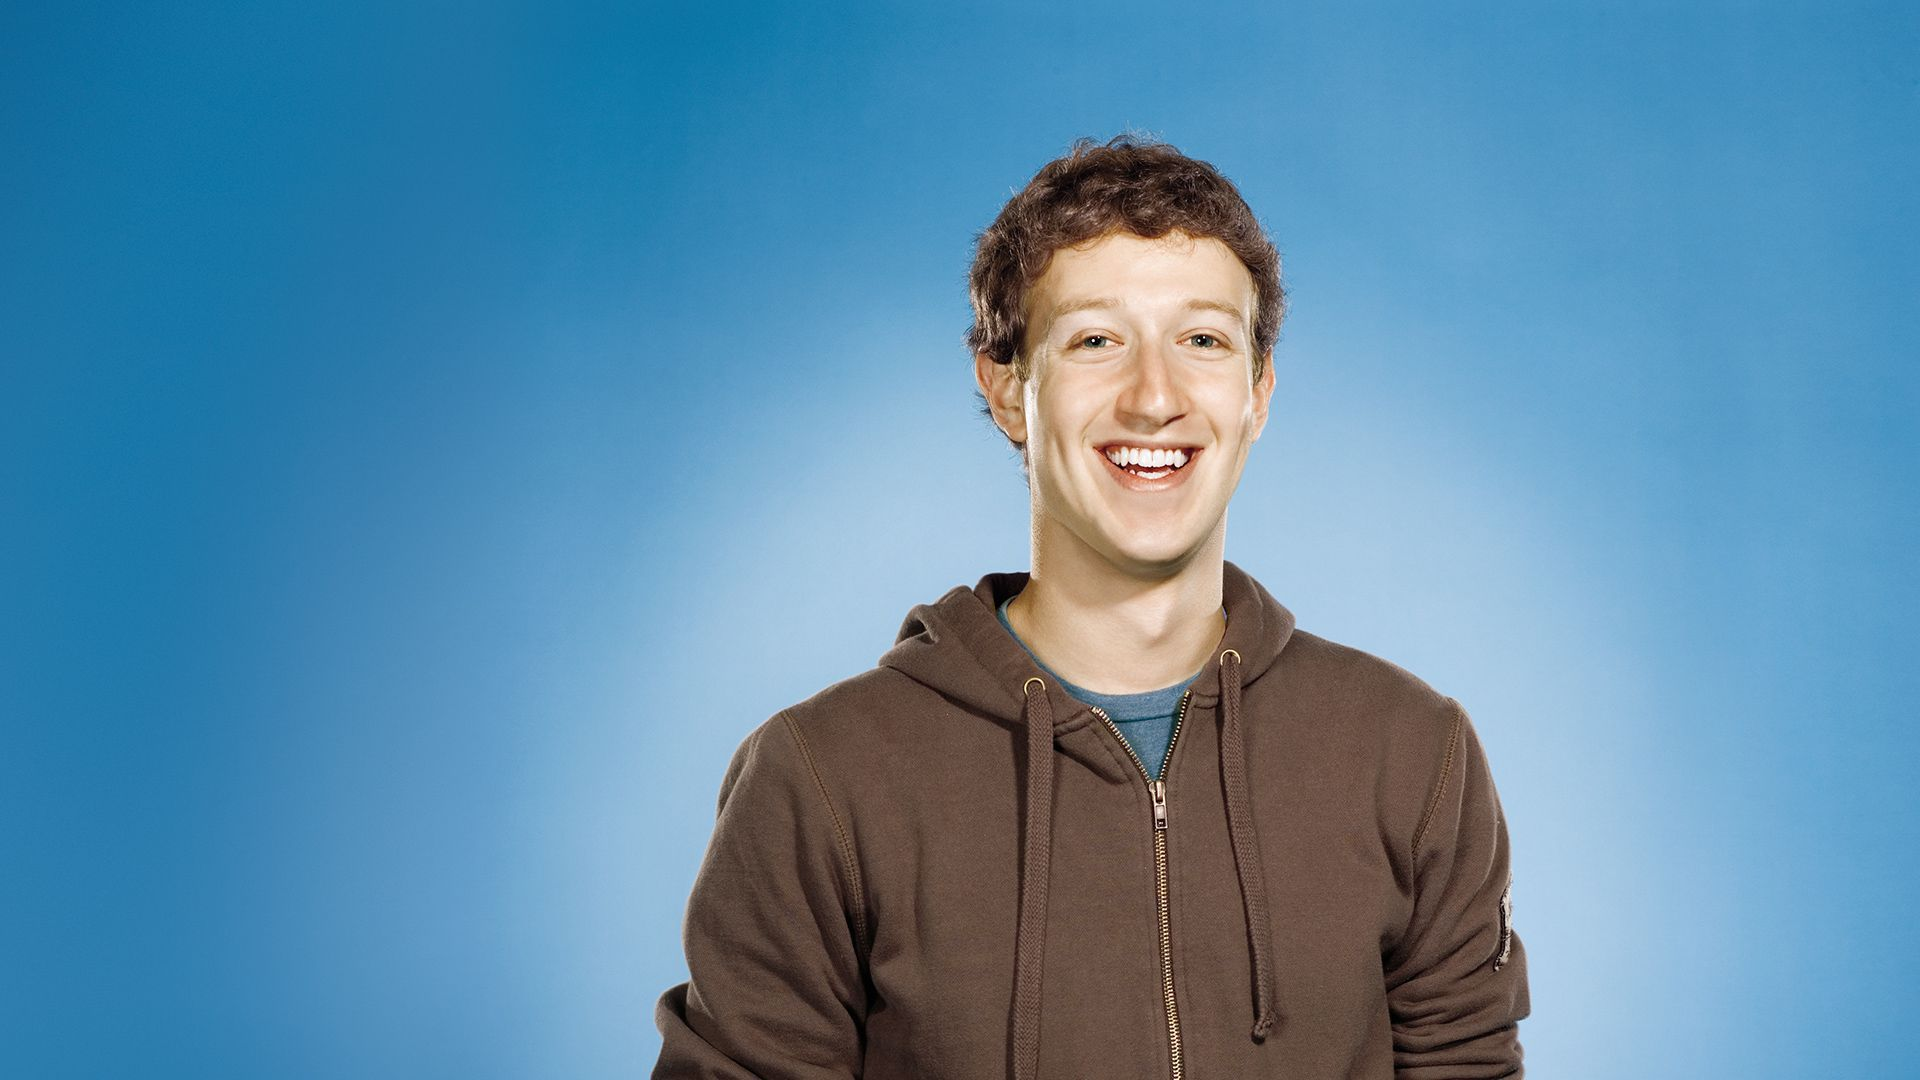 Mark Zuckerberg Wallpaper 1920x1080